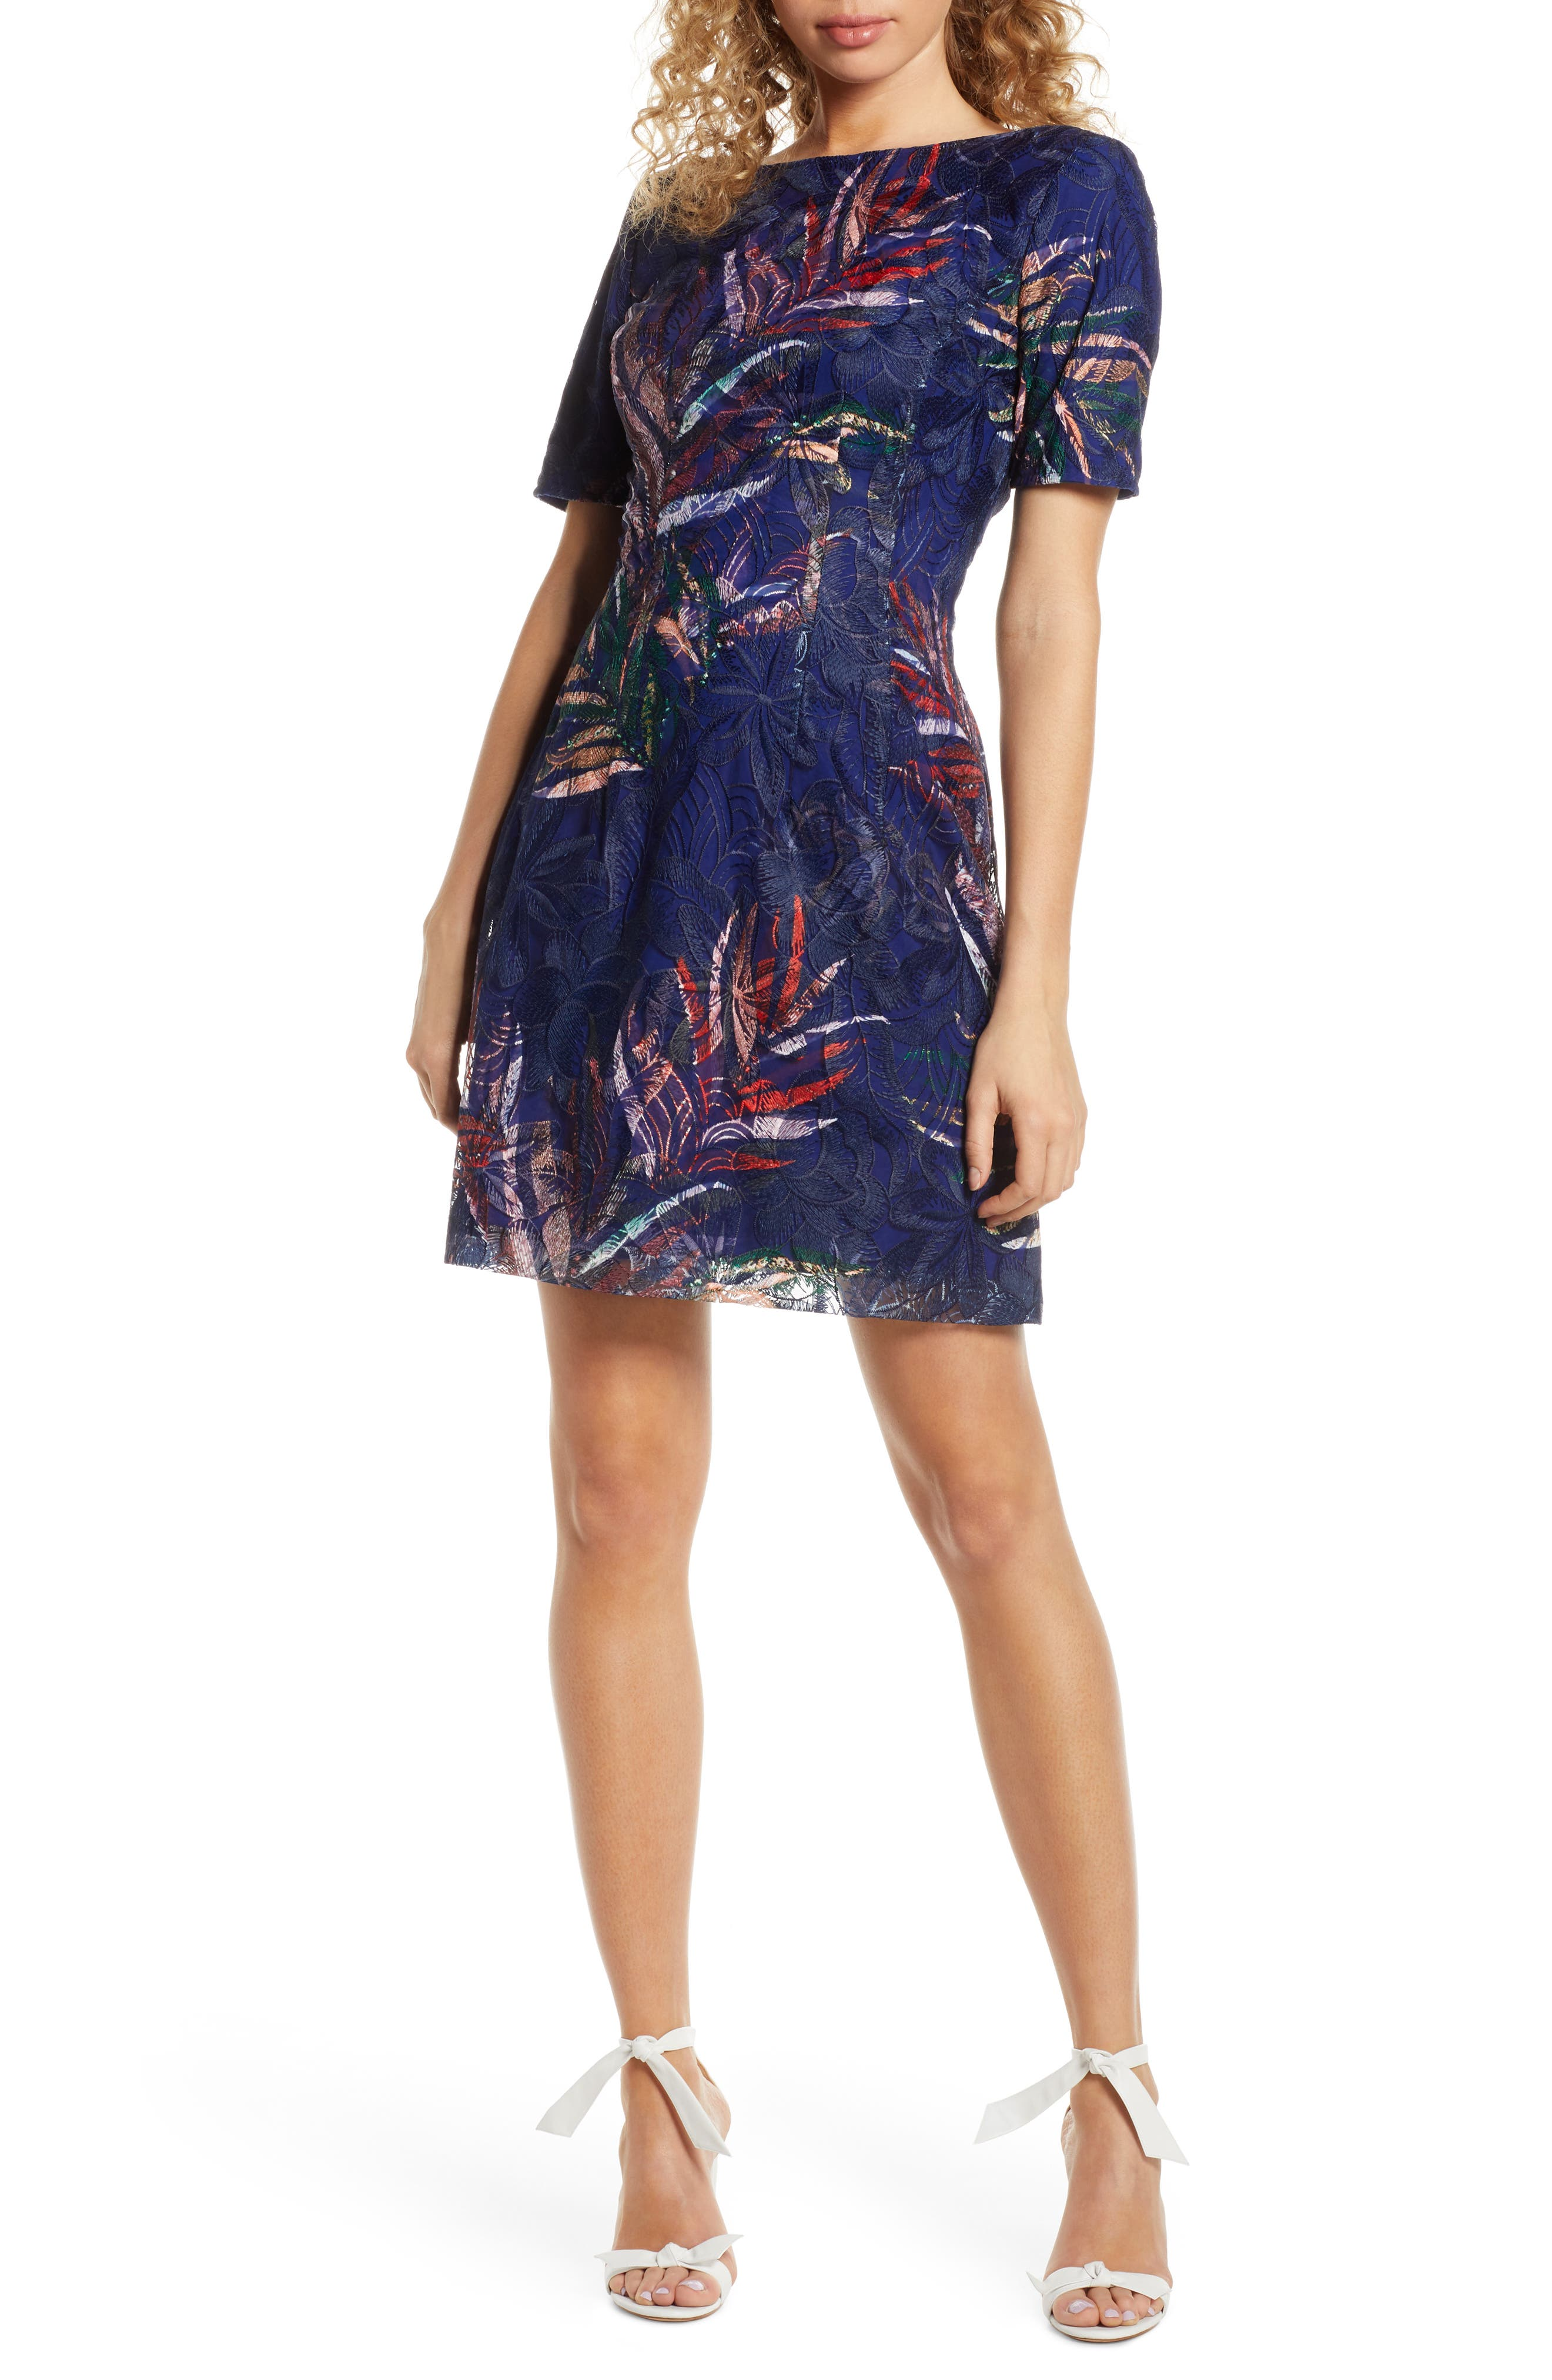 Badgley Mischka Embroidered Palm Print Sheath Dress, Blue